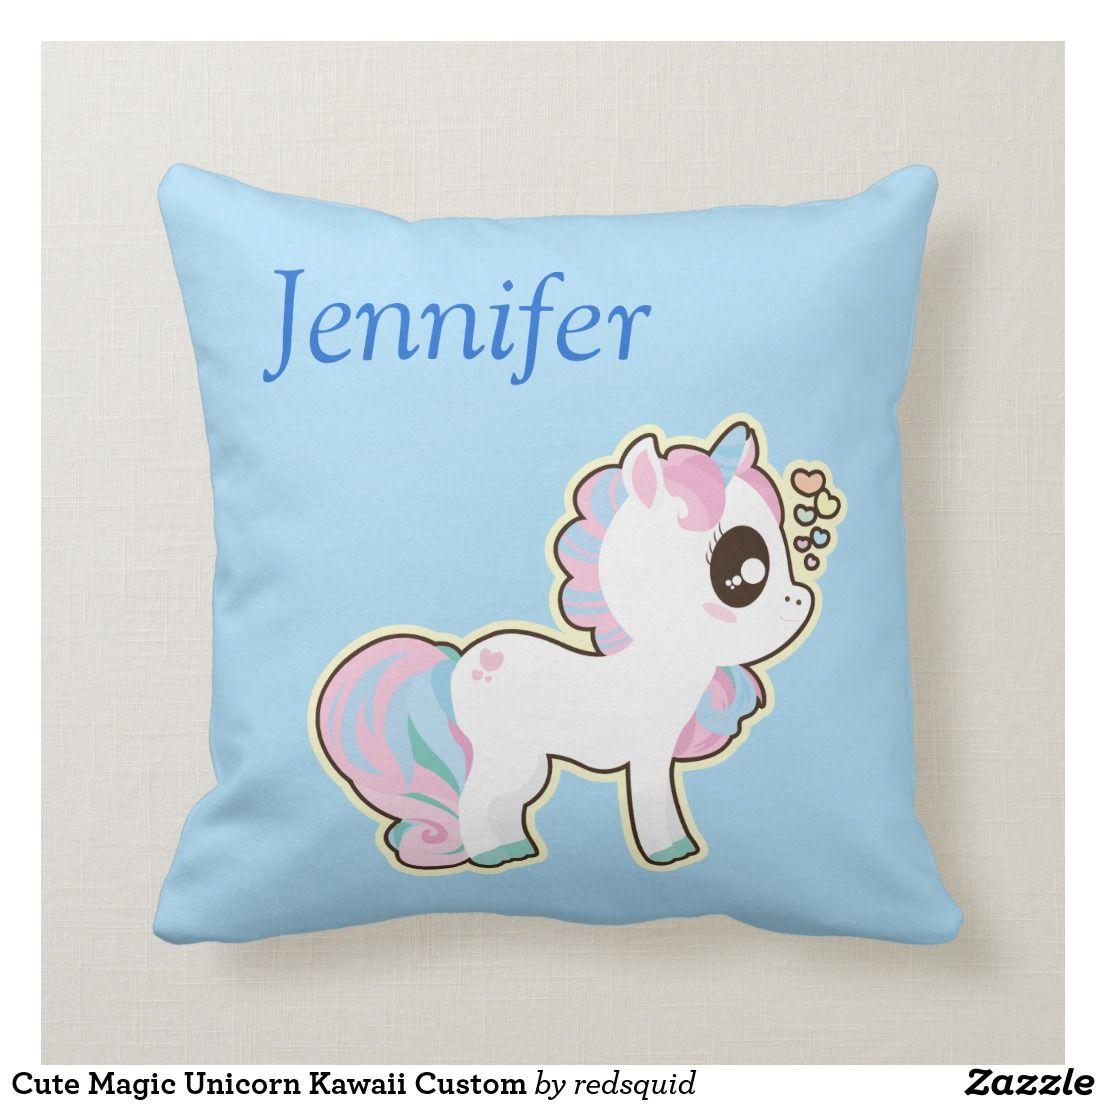 Cute magic unicorn kawaii custom throw pillow with images